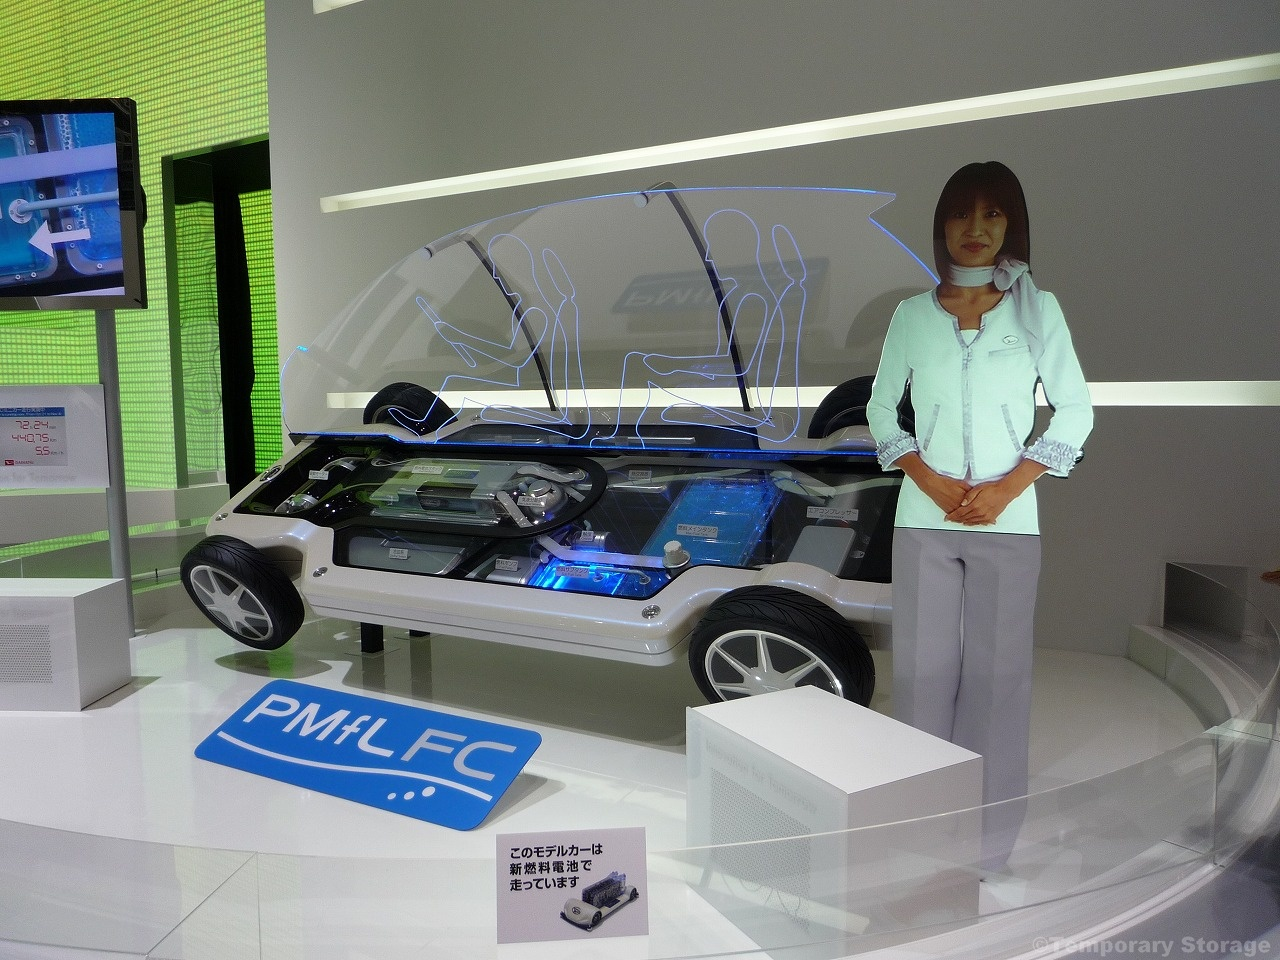 tms 2009